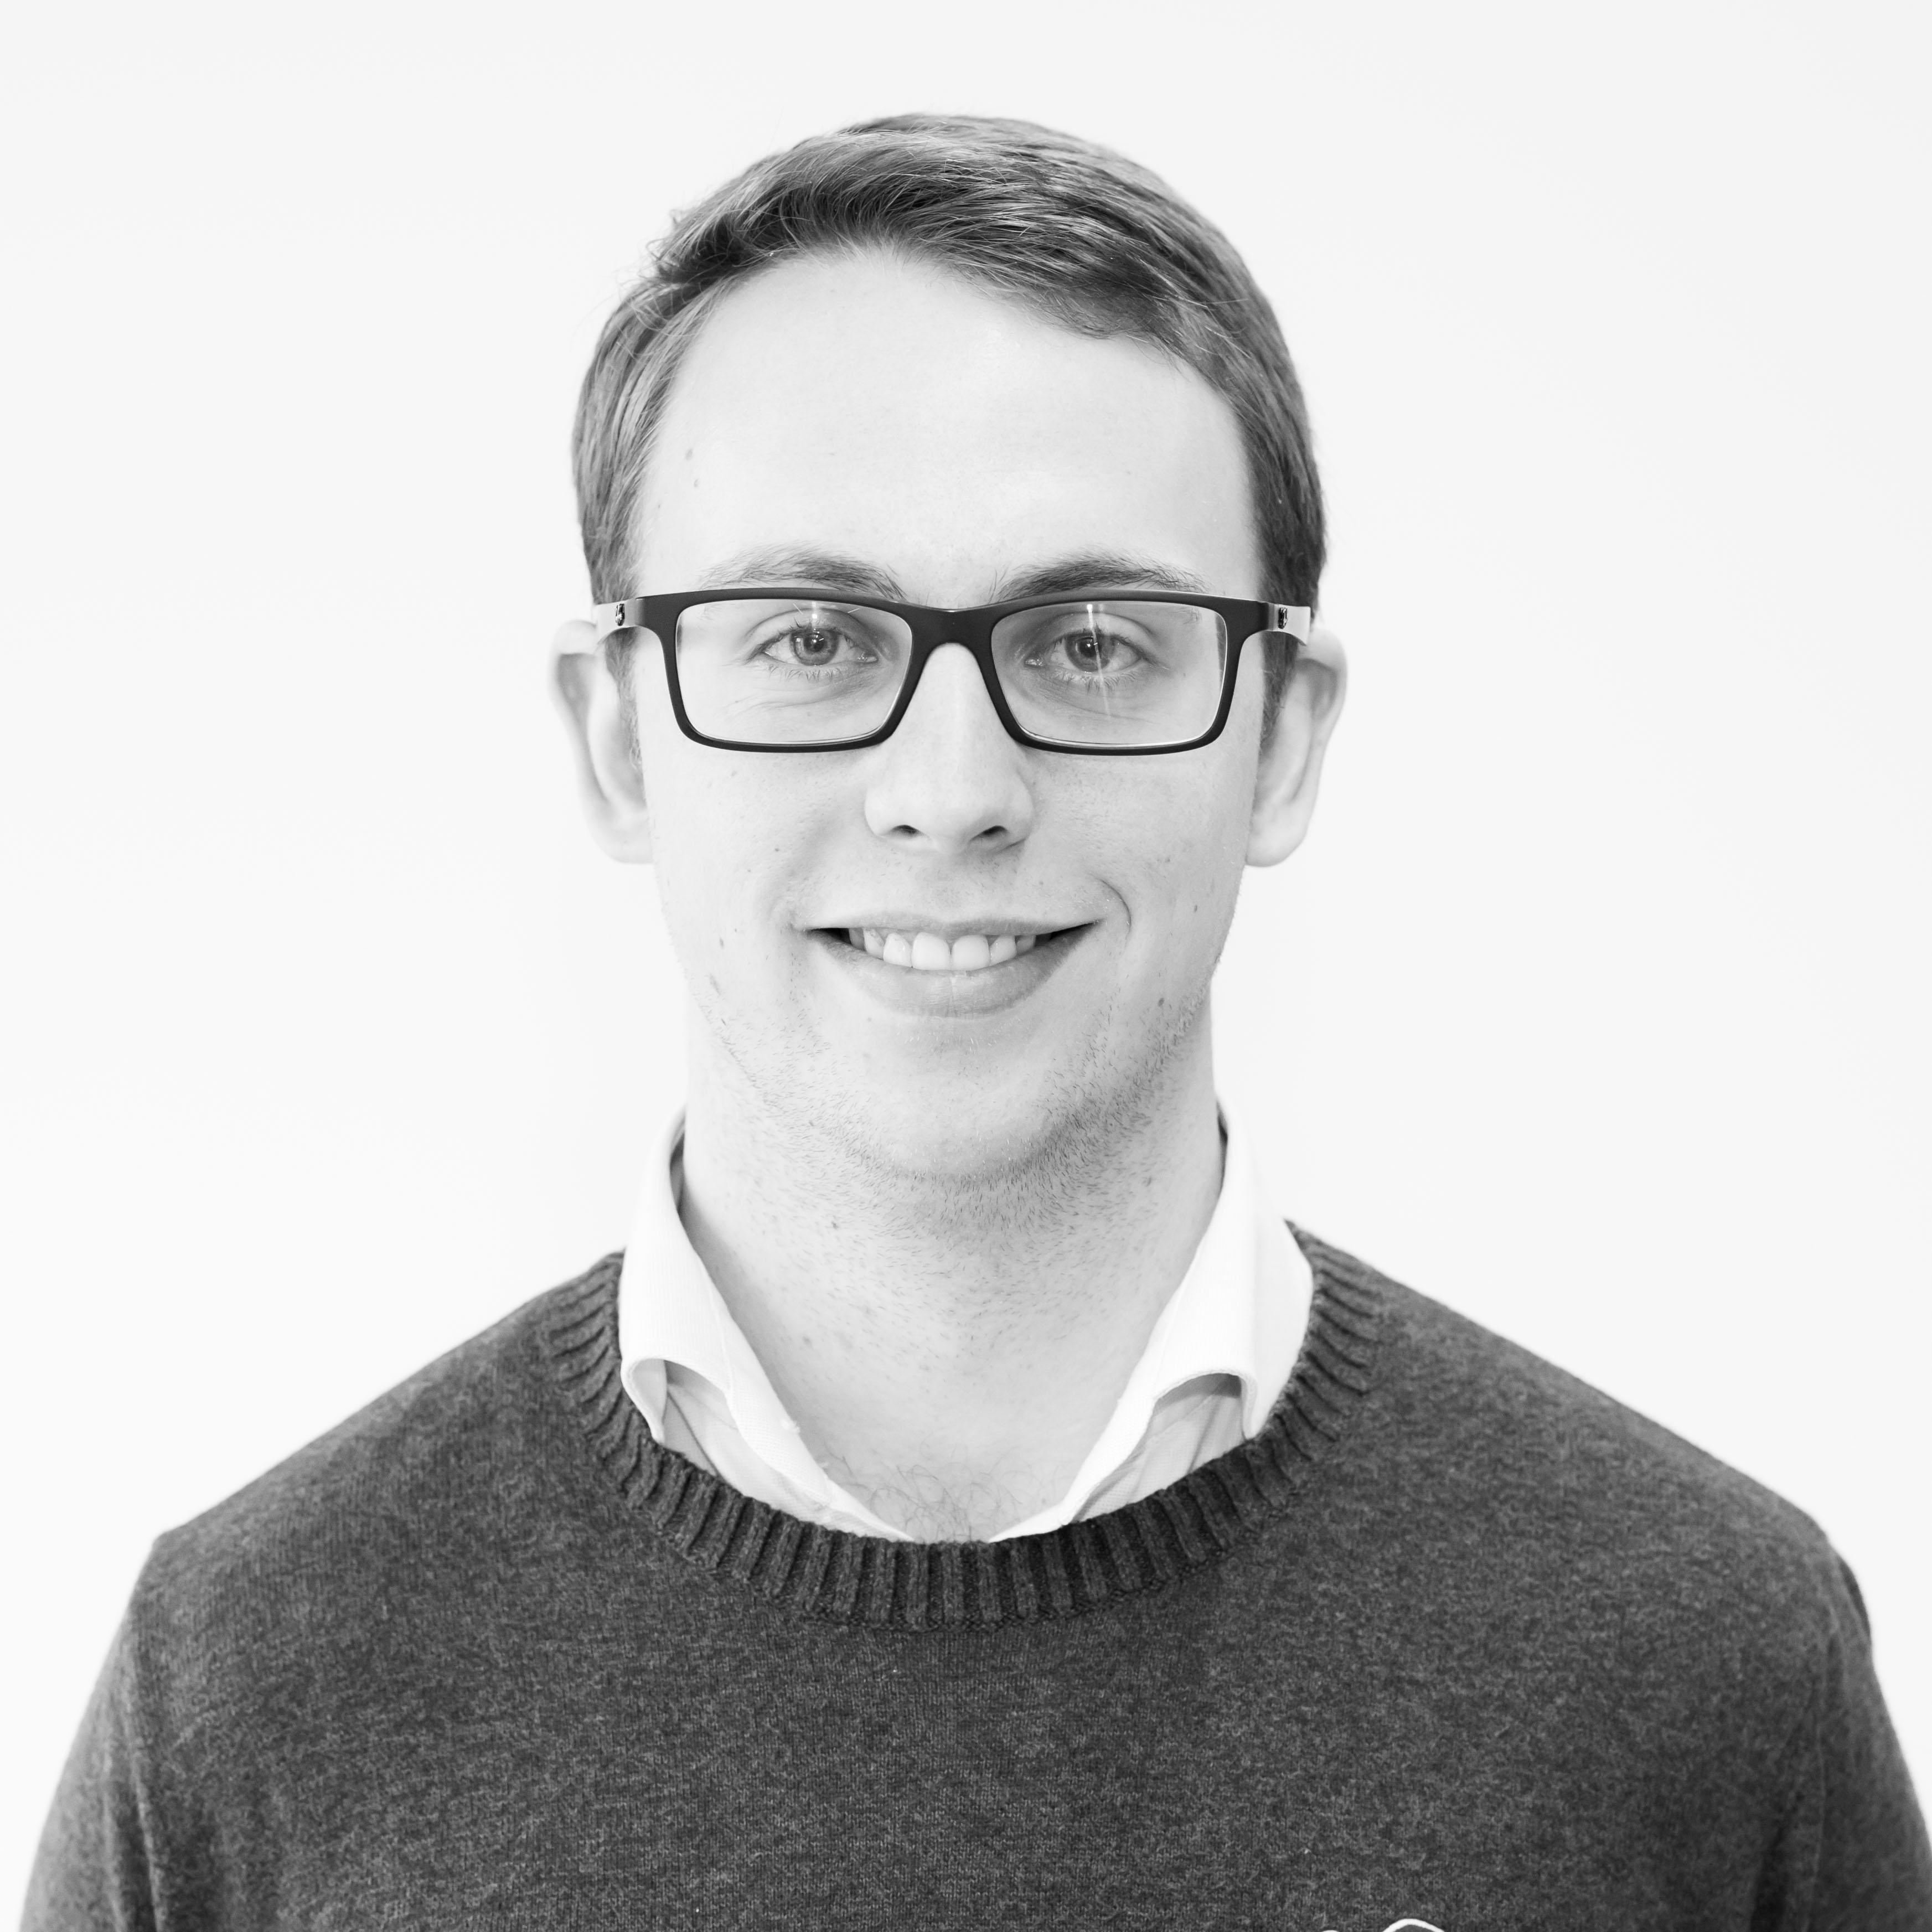 Niels Desot, Manager Birdhouse Services